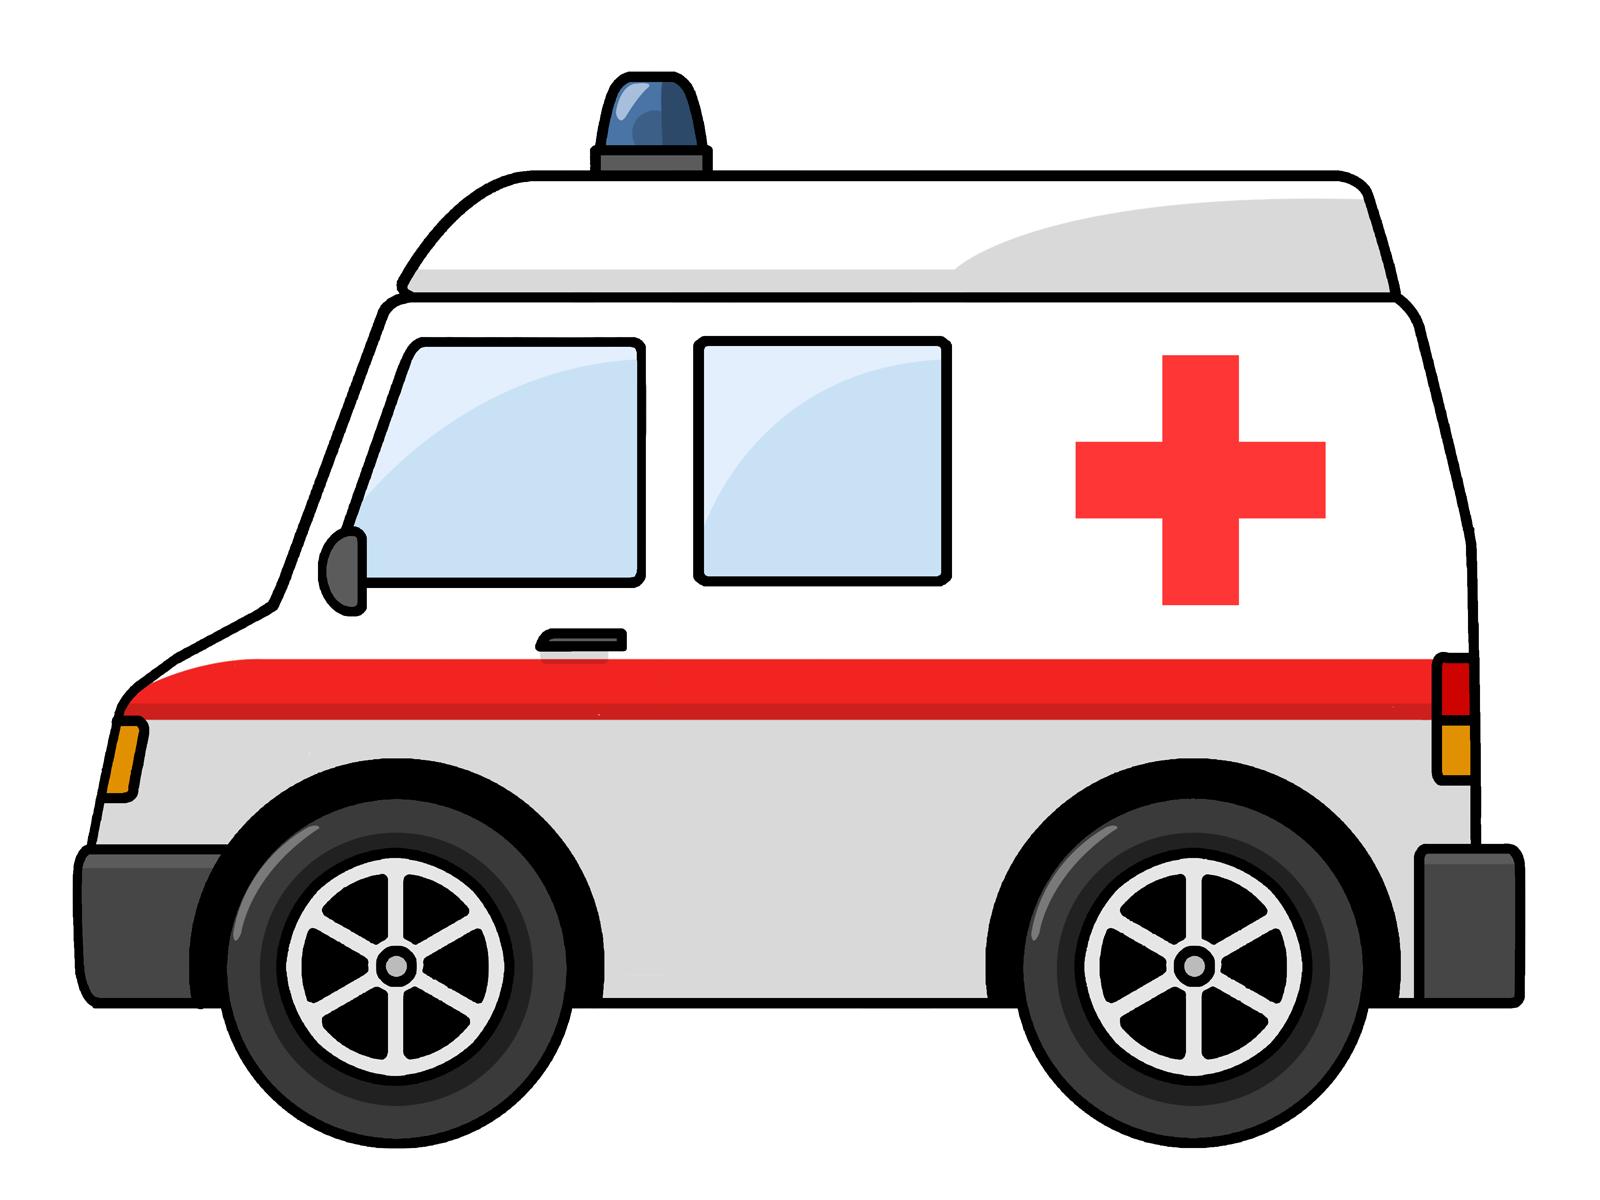 На «Нарве» вДТП савтобусом умер шофёр ипострадали 4 человека